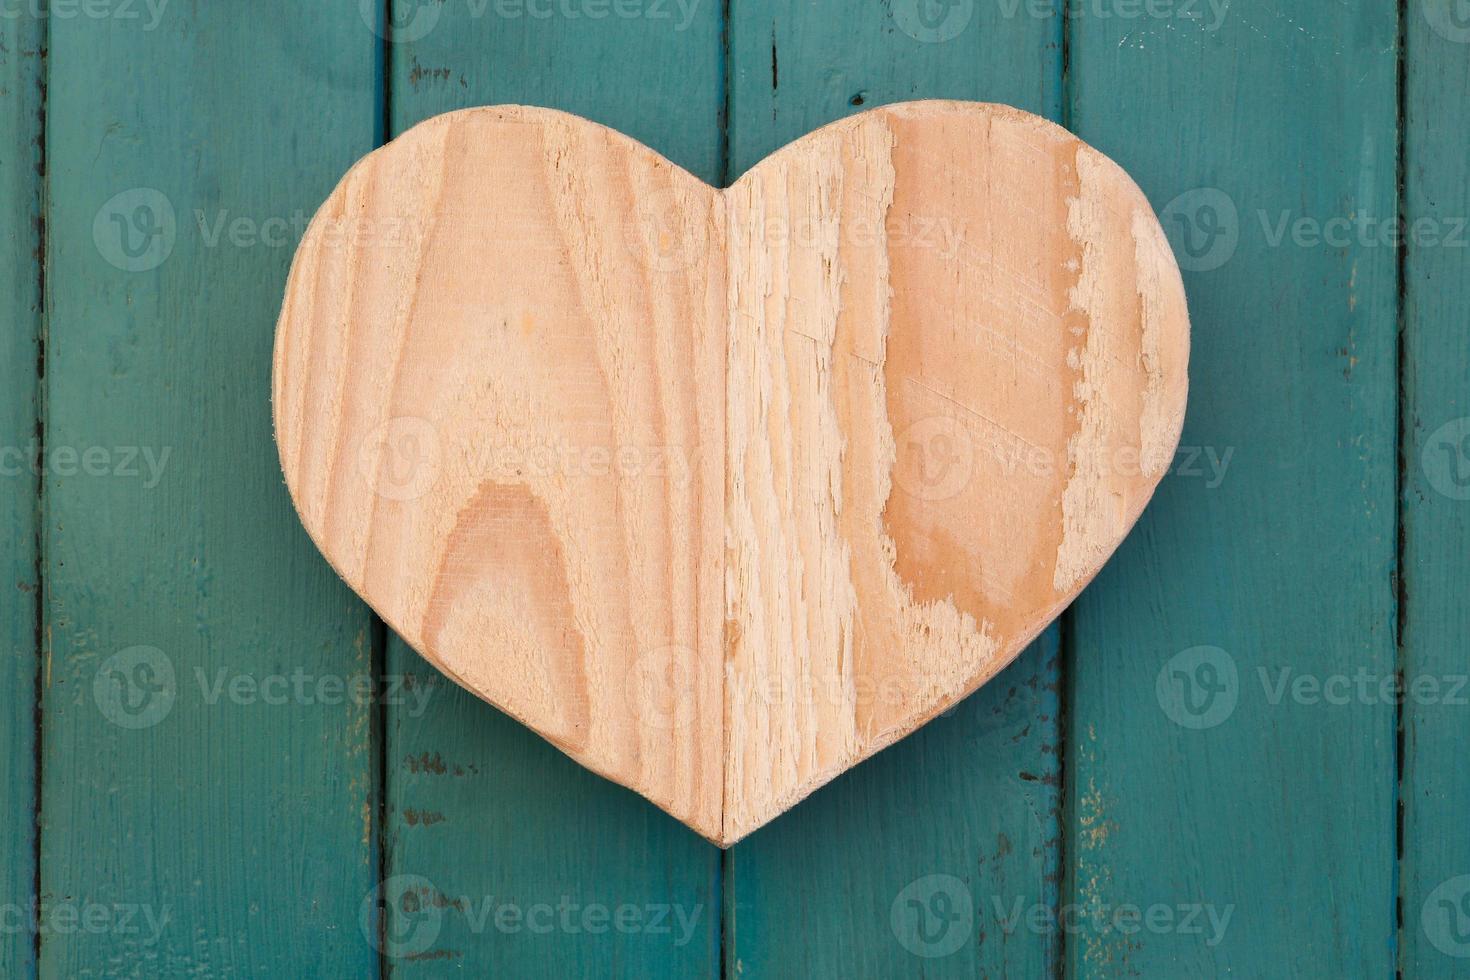 Amor corazón de madera de San Valentín sobre fondo pintado de color turquesa foto